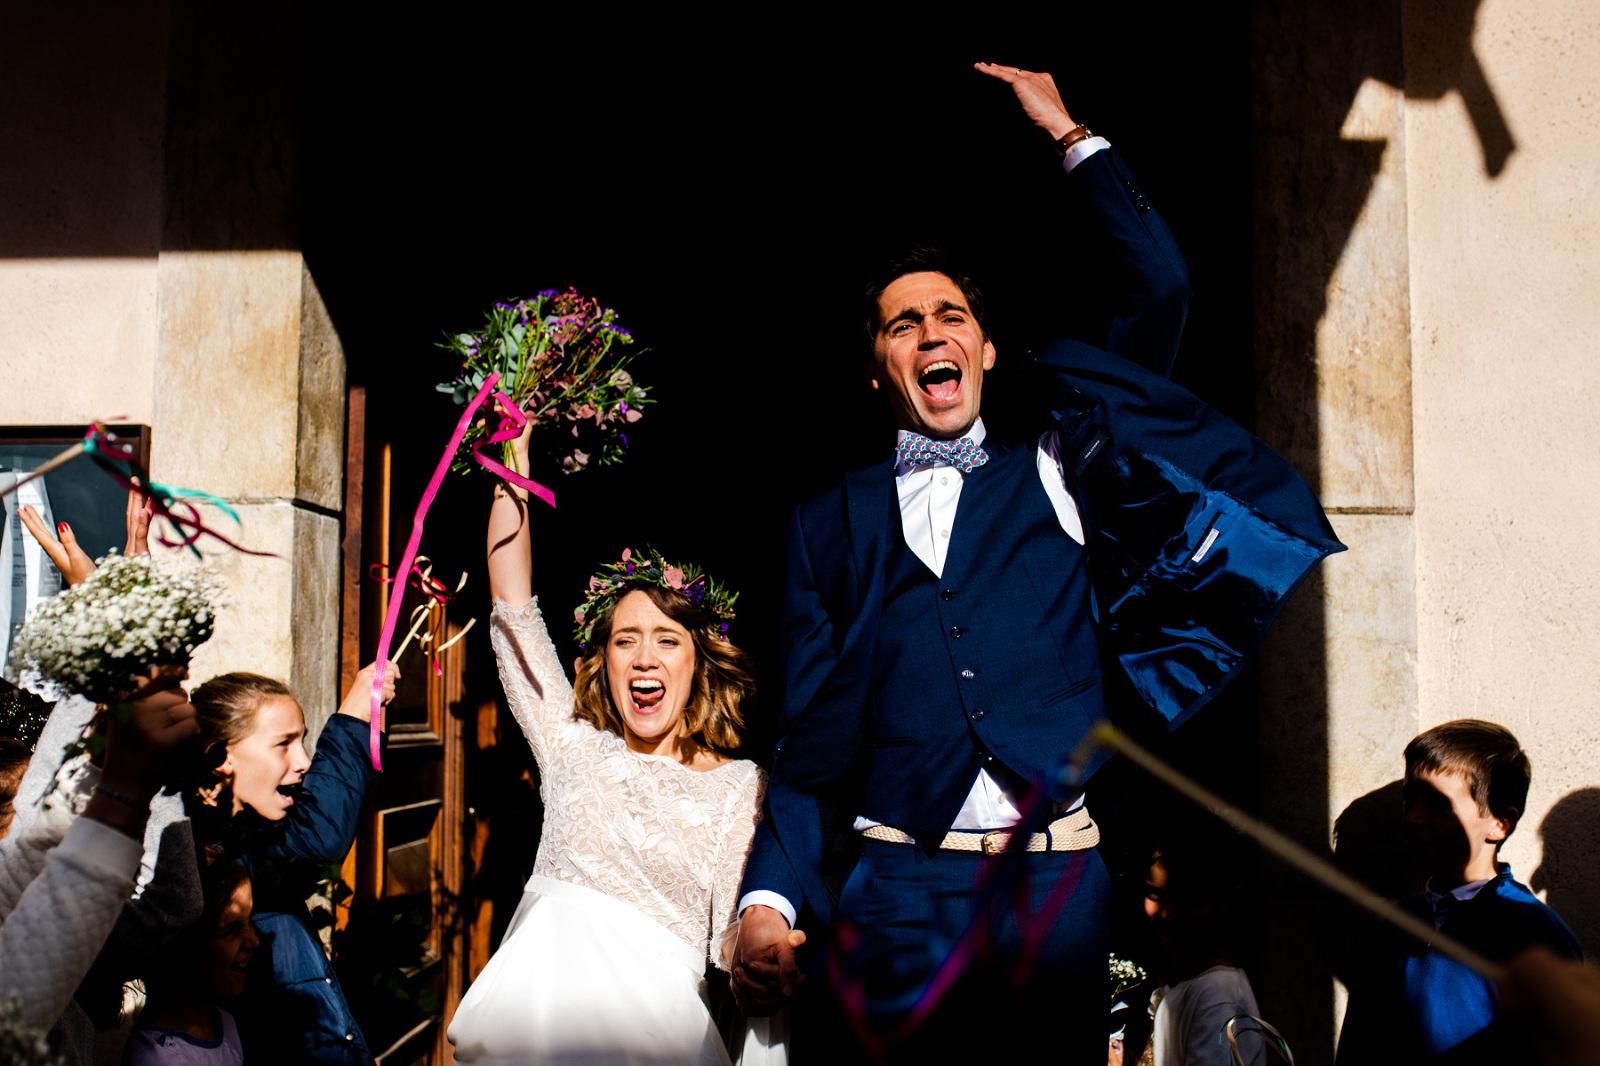 mariage-sortie-église-joie